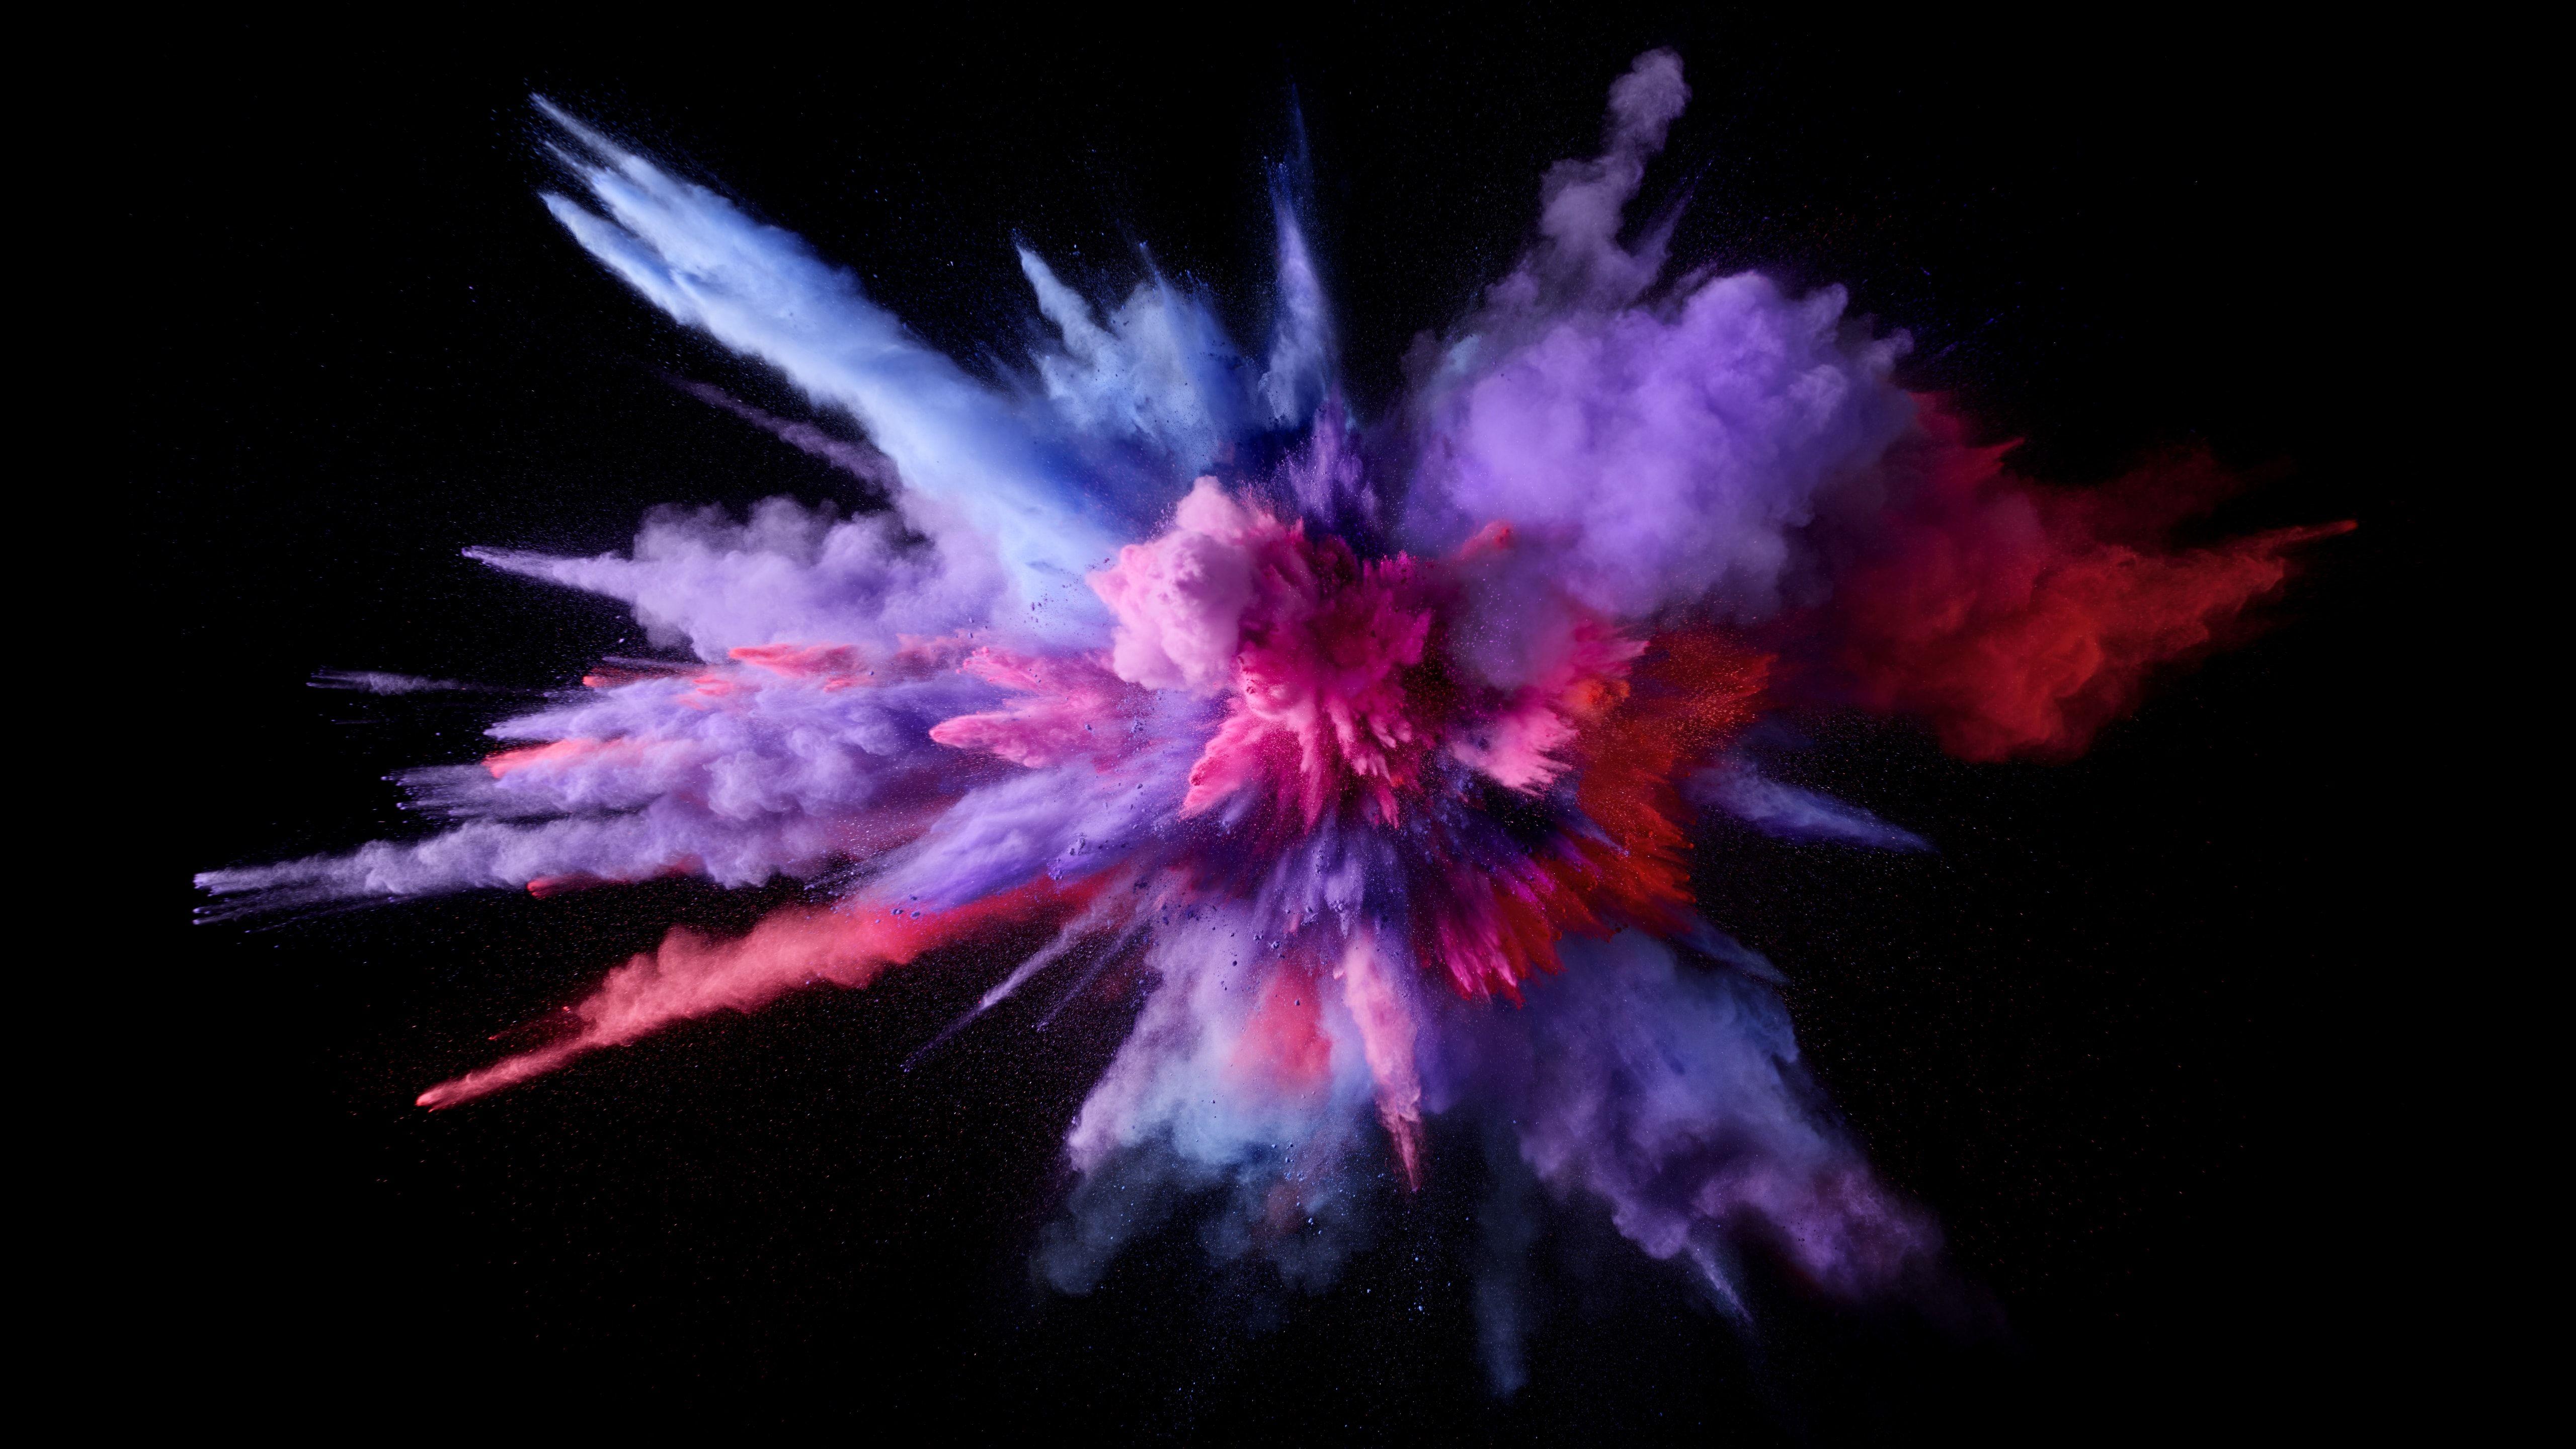 Mac Os Sierra Color Splash Purple Explosion Colors 5k Is An HD Desktop Wallpaper Posted In Our Free